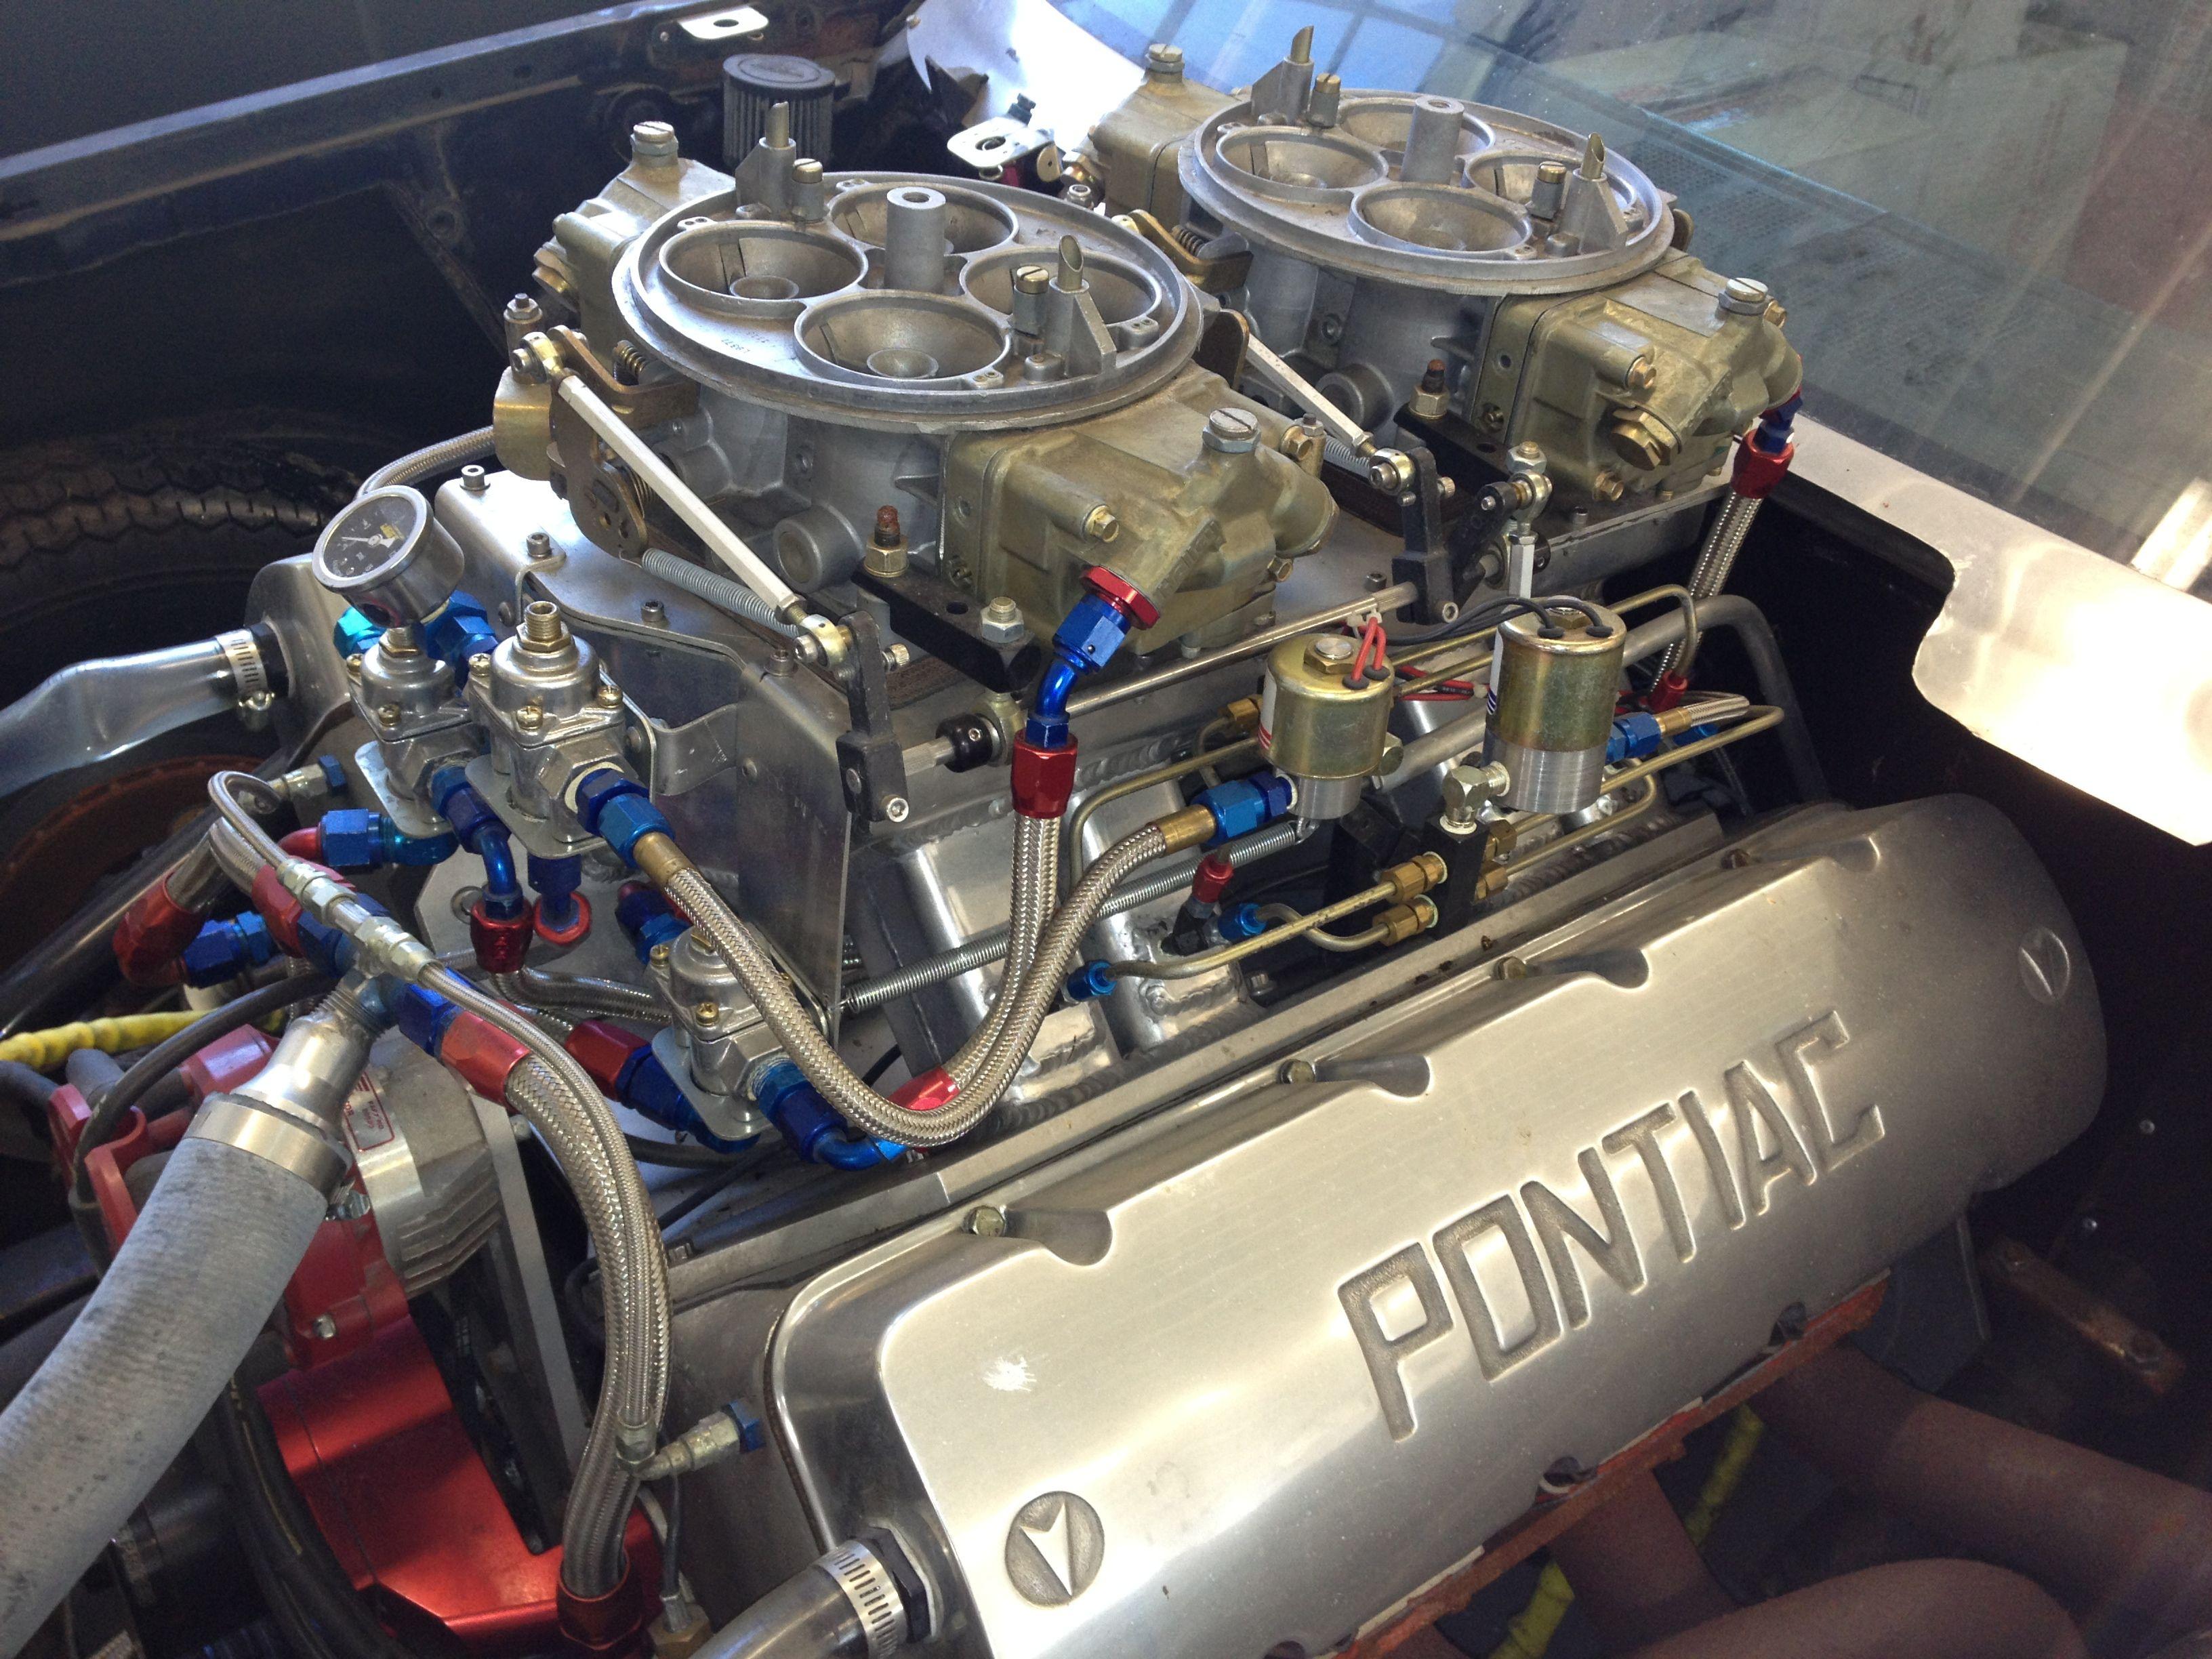 572 Big Block Chevy with Pontiac 427 Pro Stock Heads